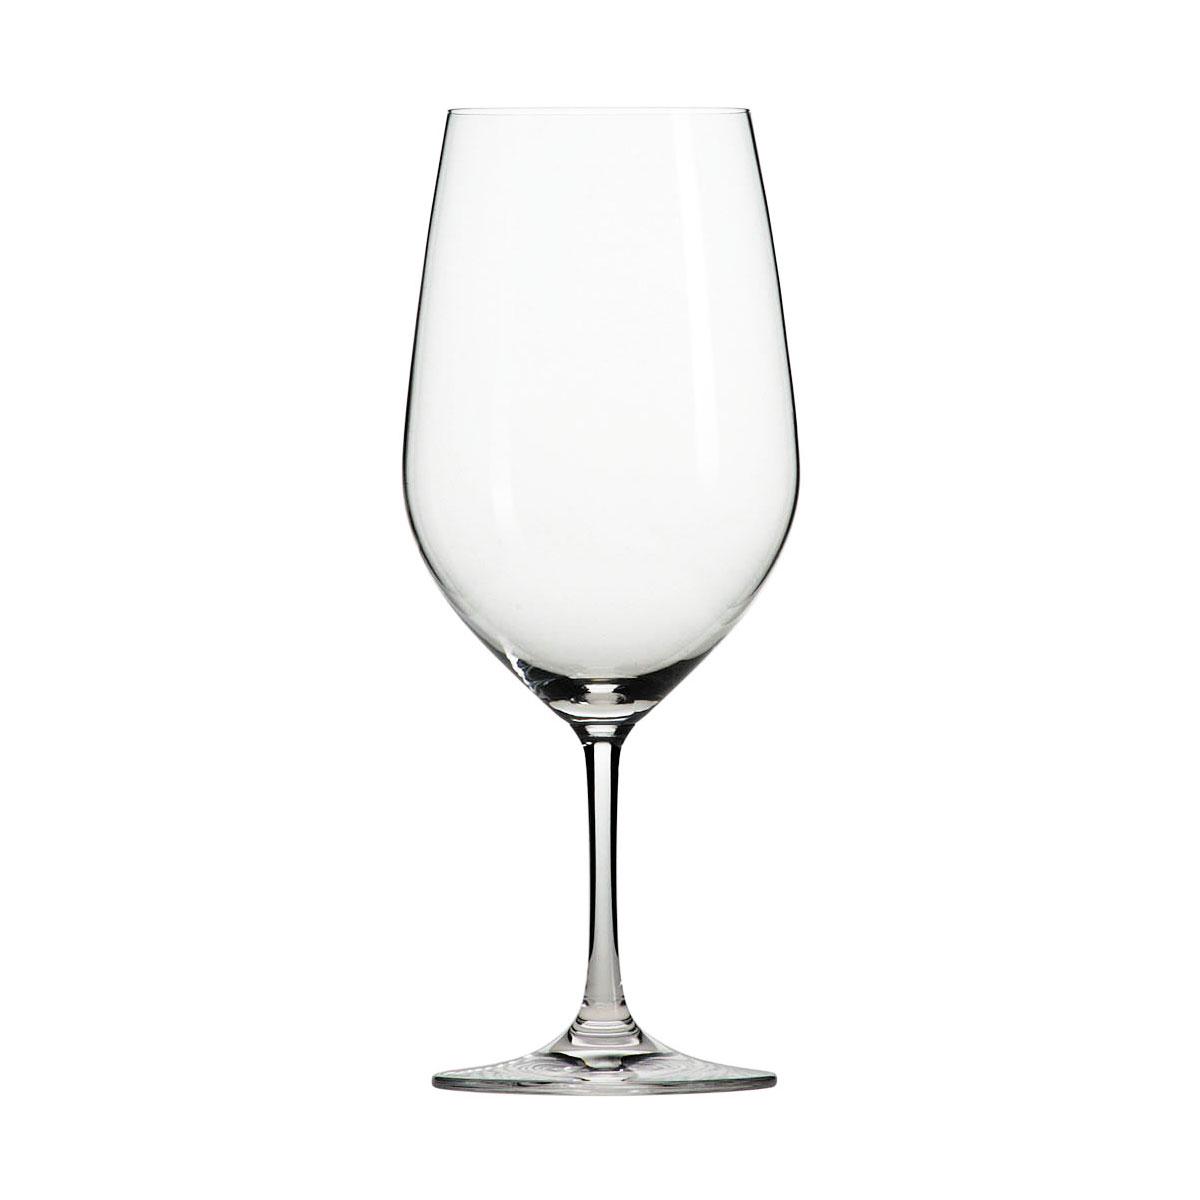 Schott Zwiesel Tritan Crystal, Forte Claret Crystal Goblet, Single